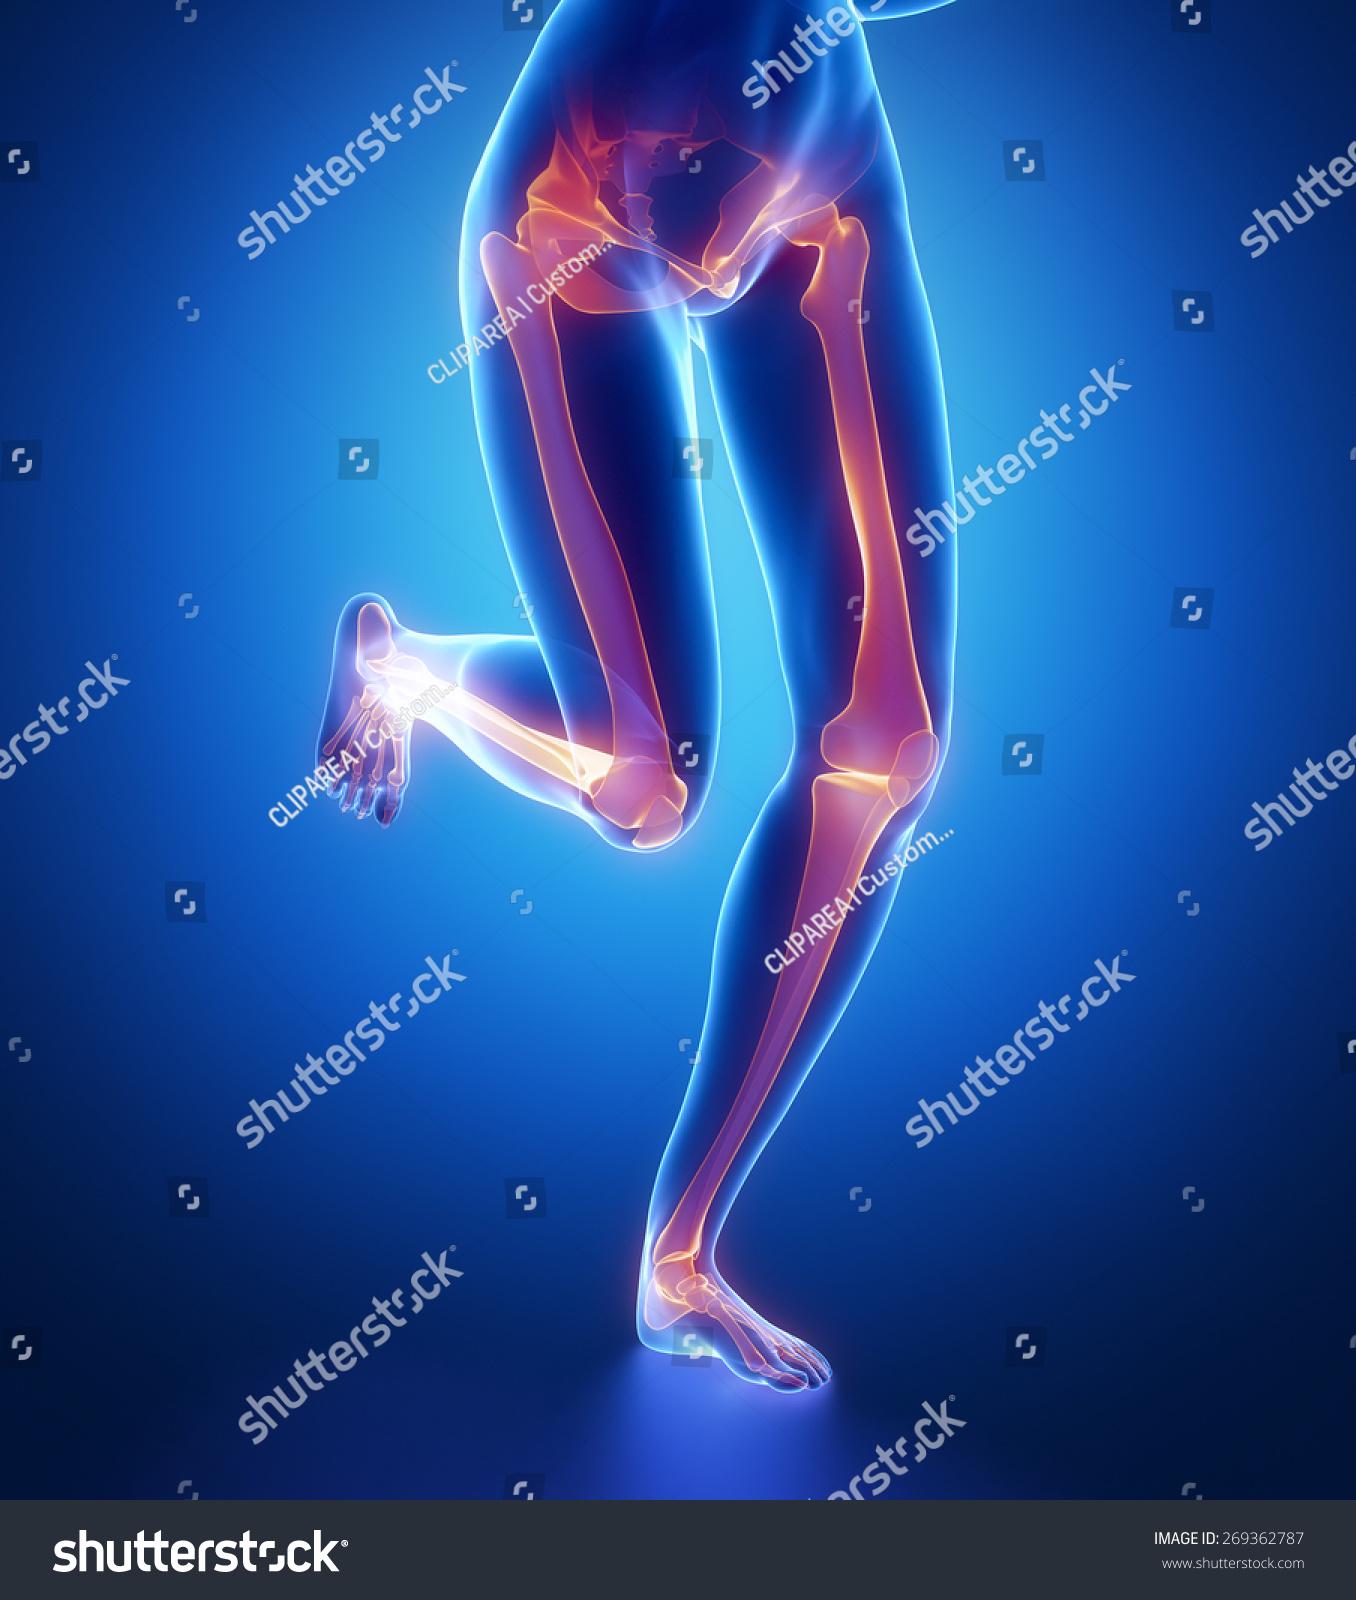 Royalty Free Stock Illustration Of Focused On Leg Bones Anatomy